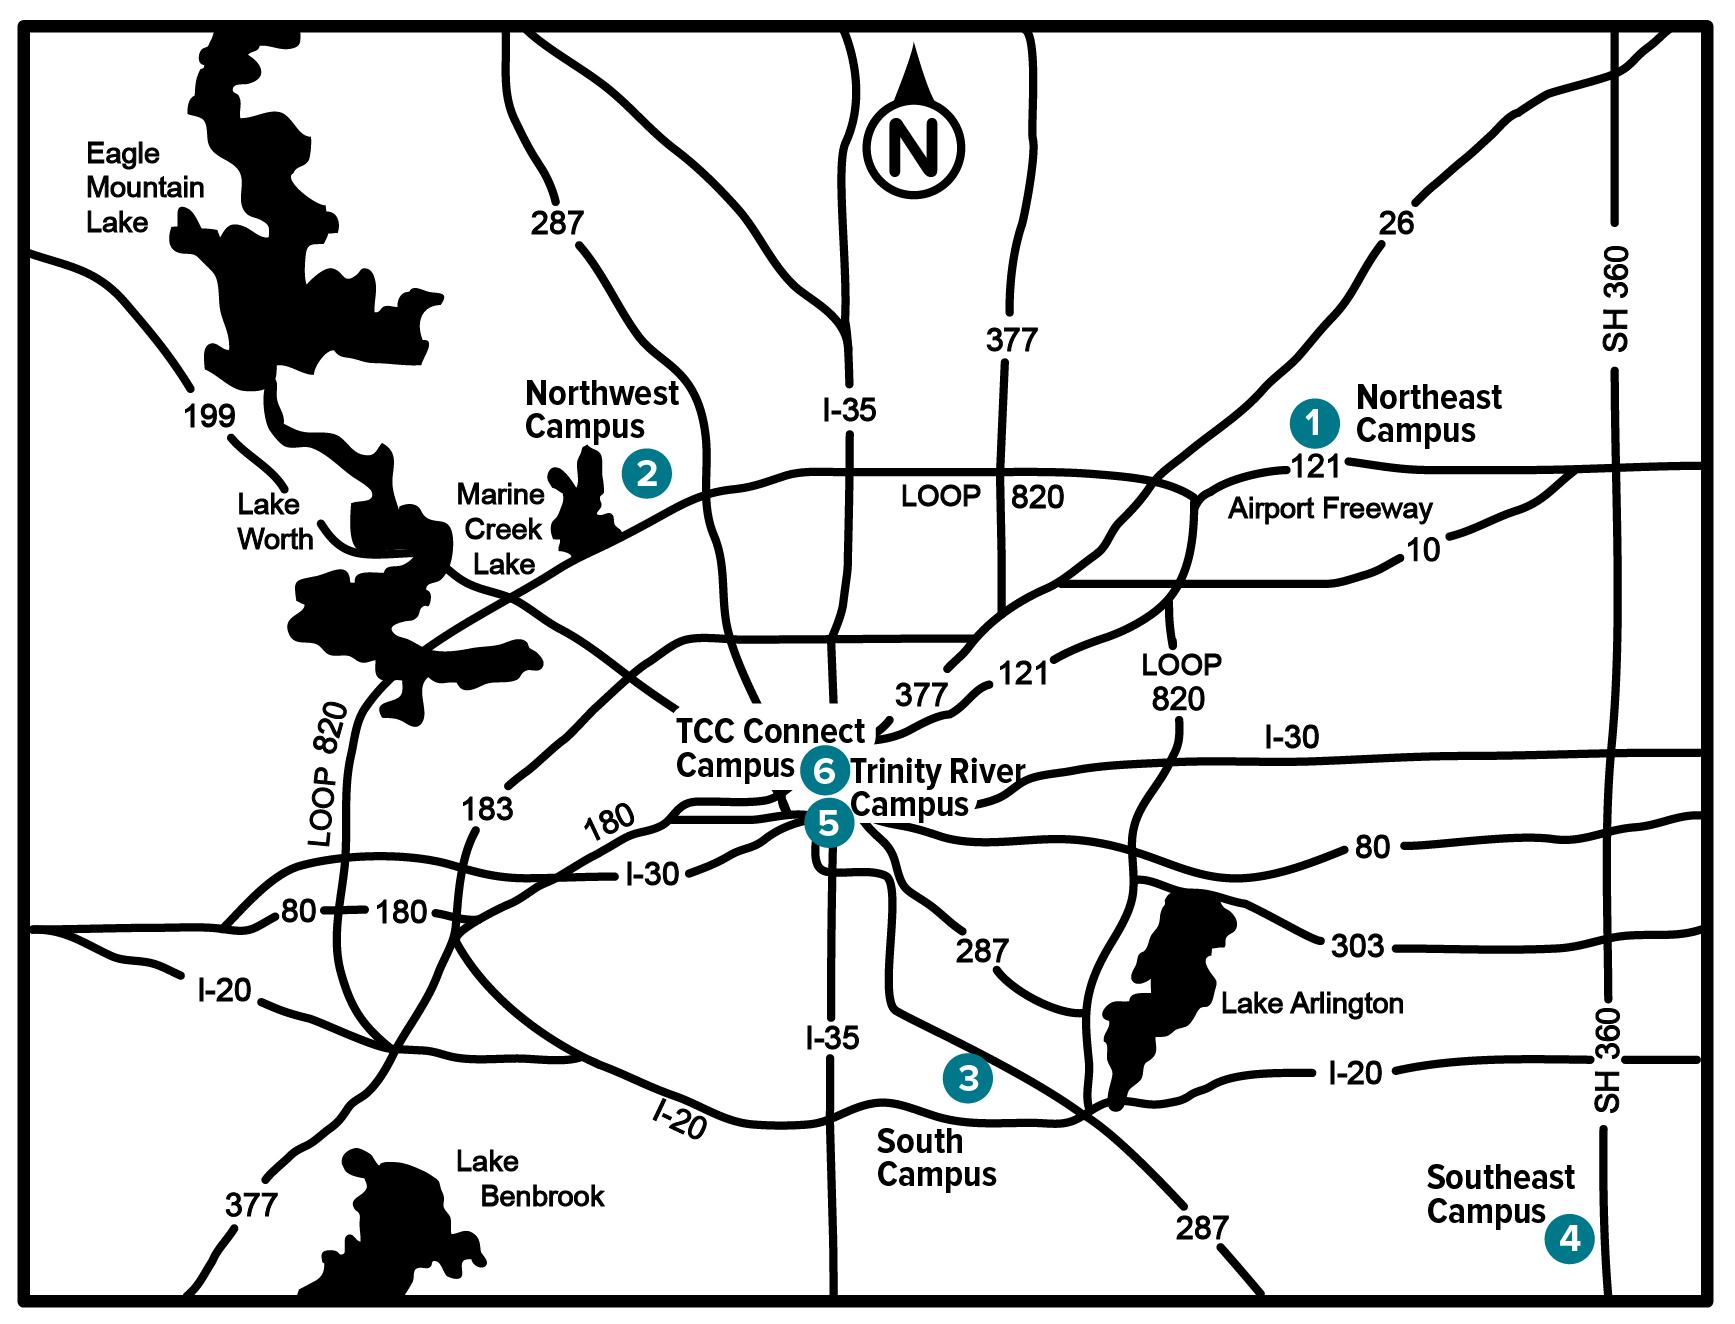 Tcc South Campus Map Mississippi Delta Map Stockholm Map